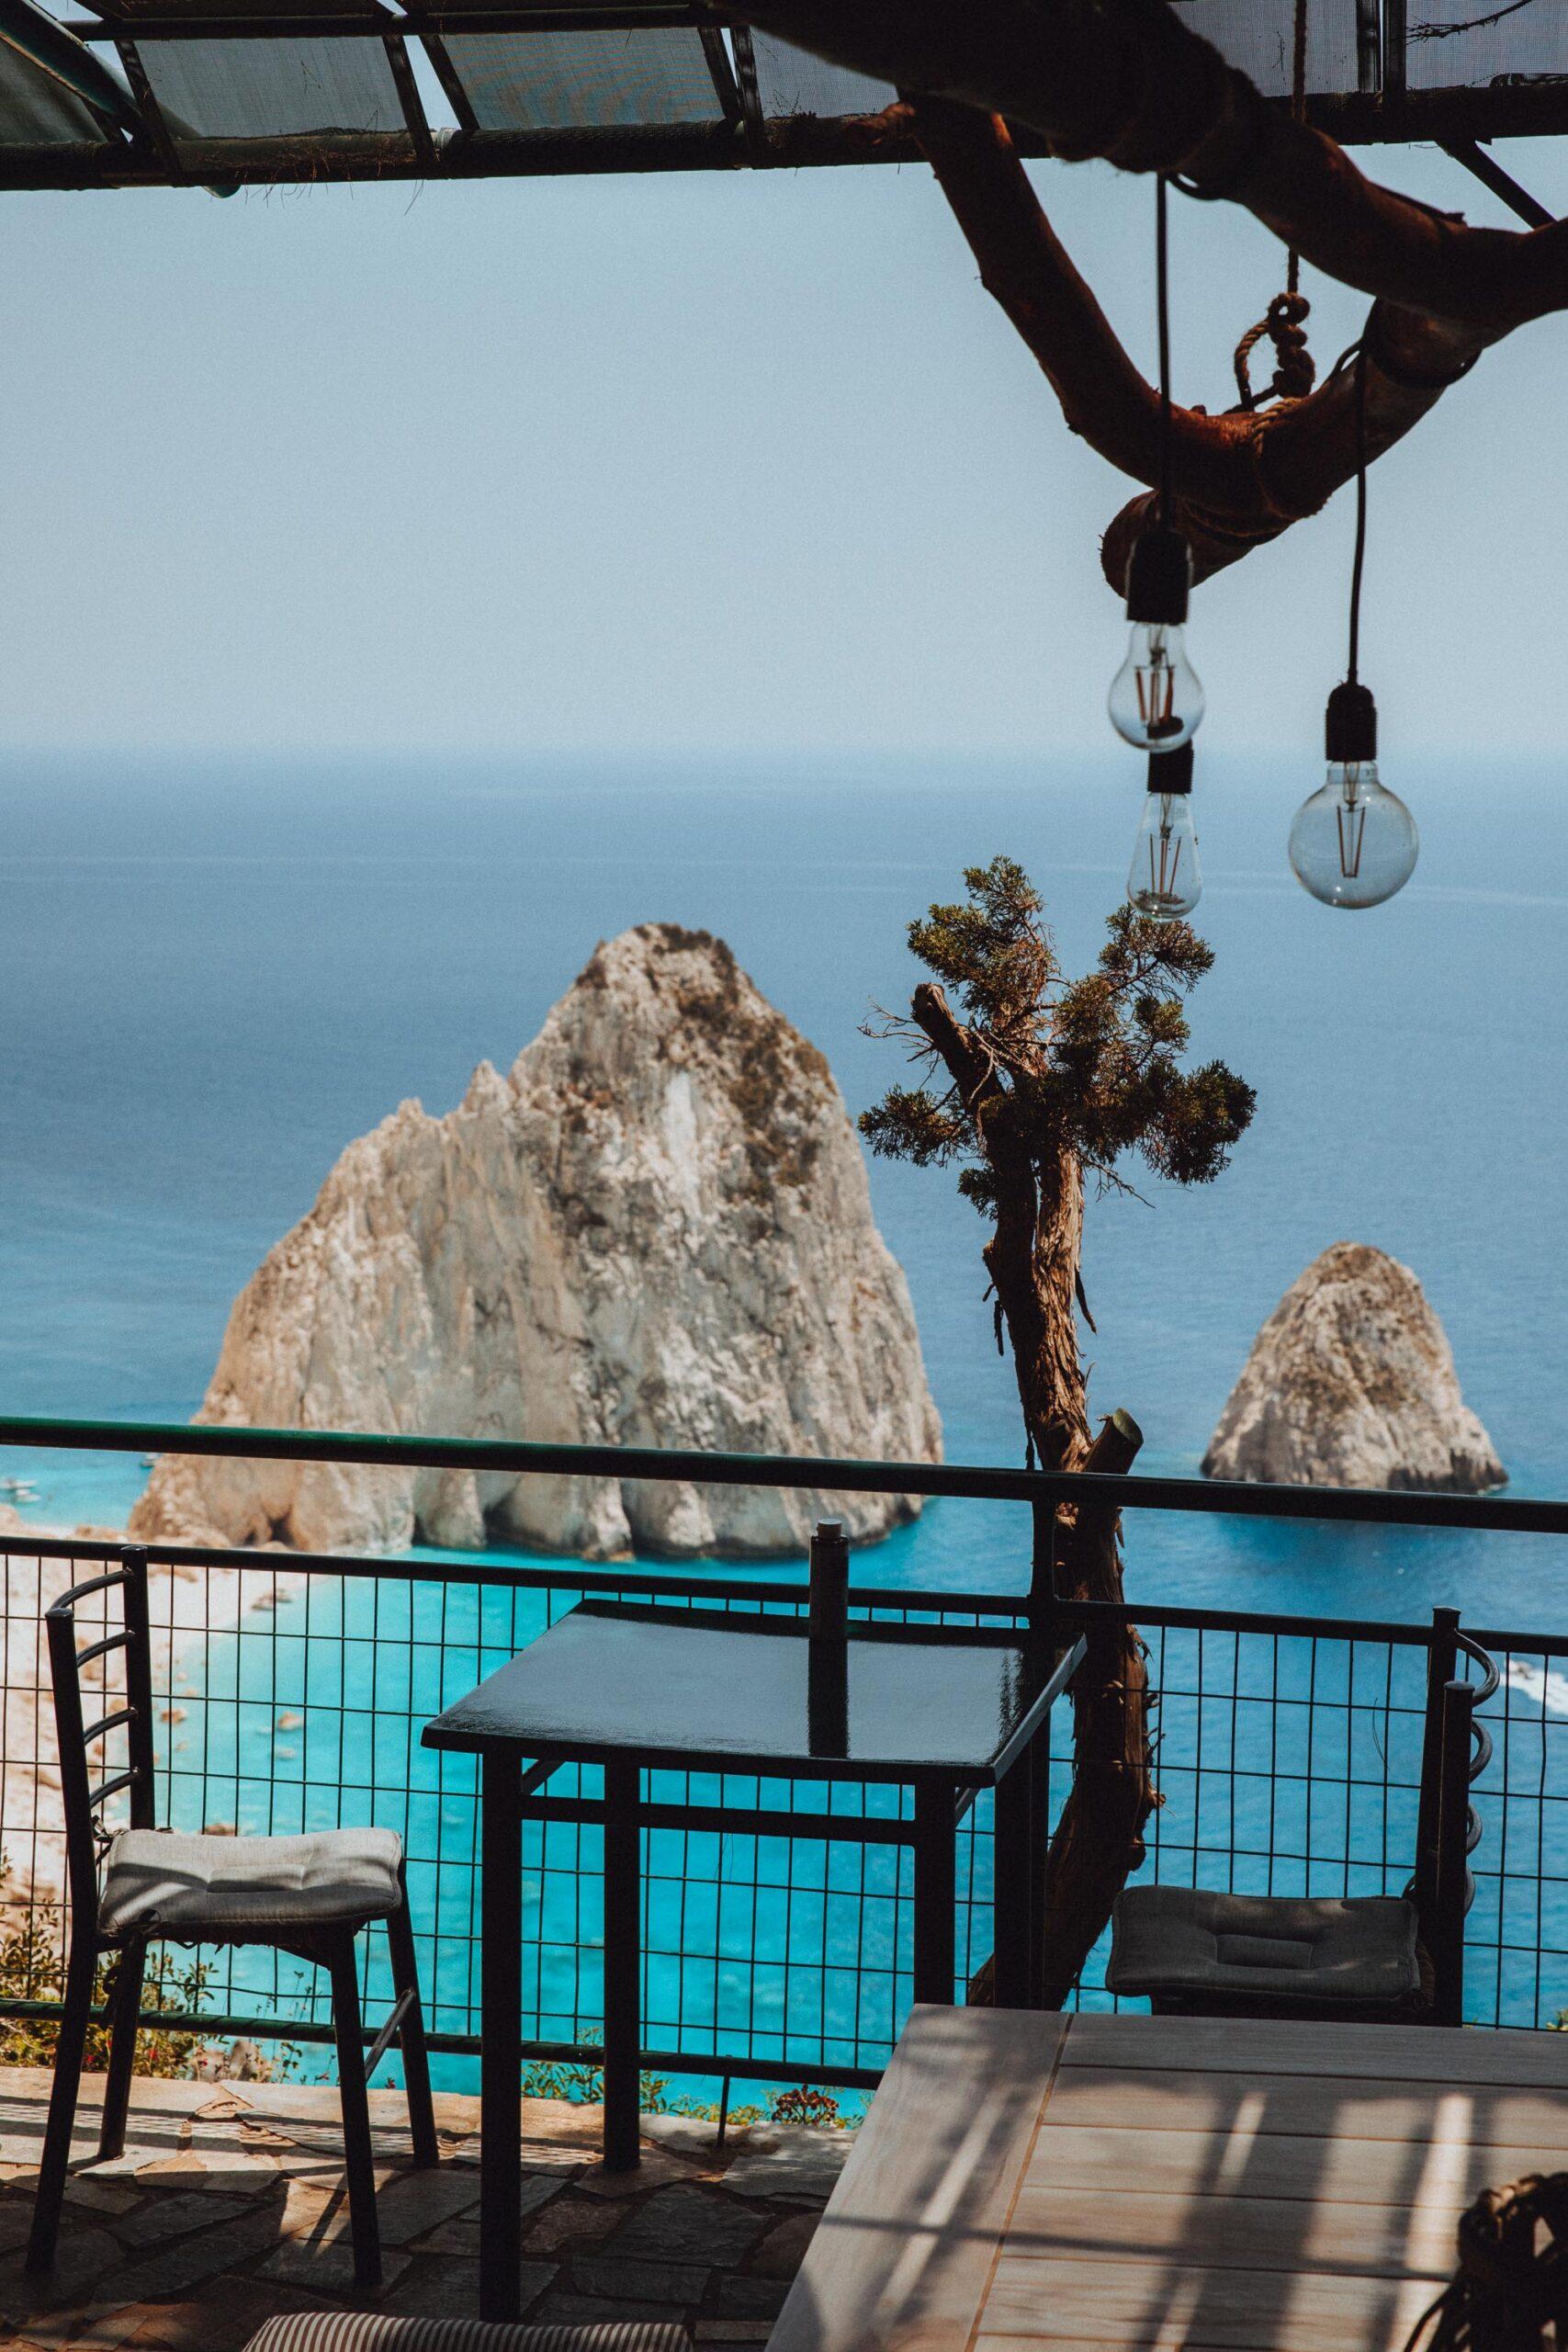 Keri lighthouse restaurant for views of Mizithres in Zakynthos Greece